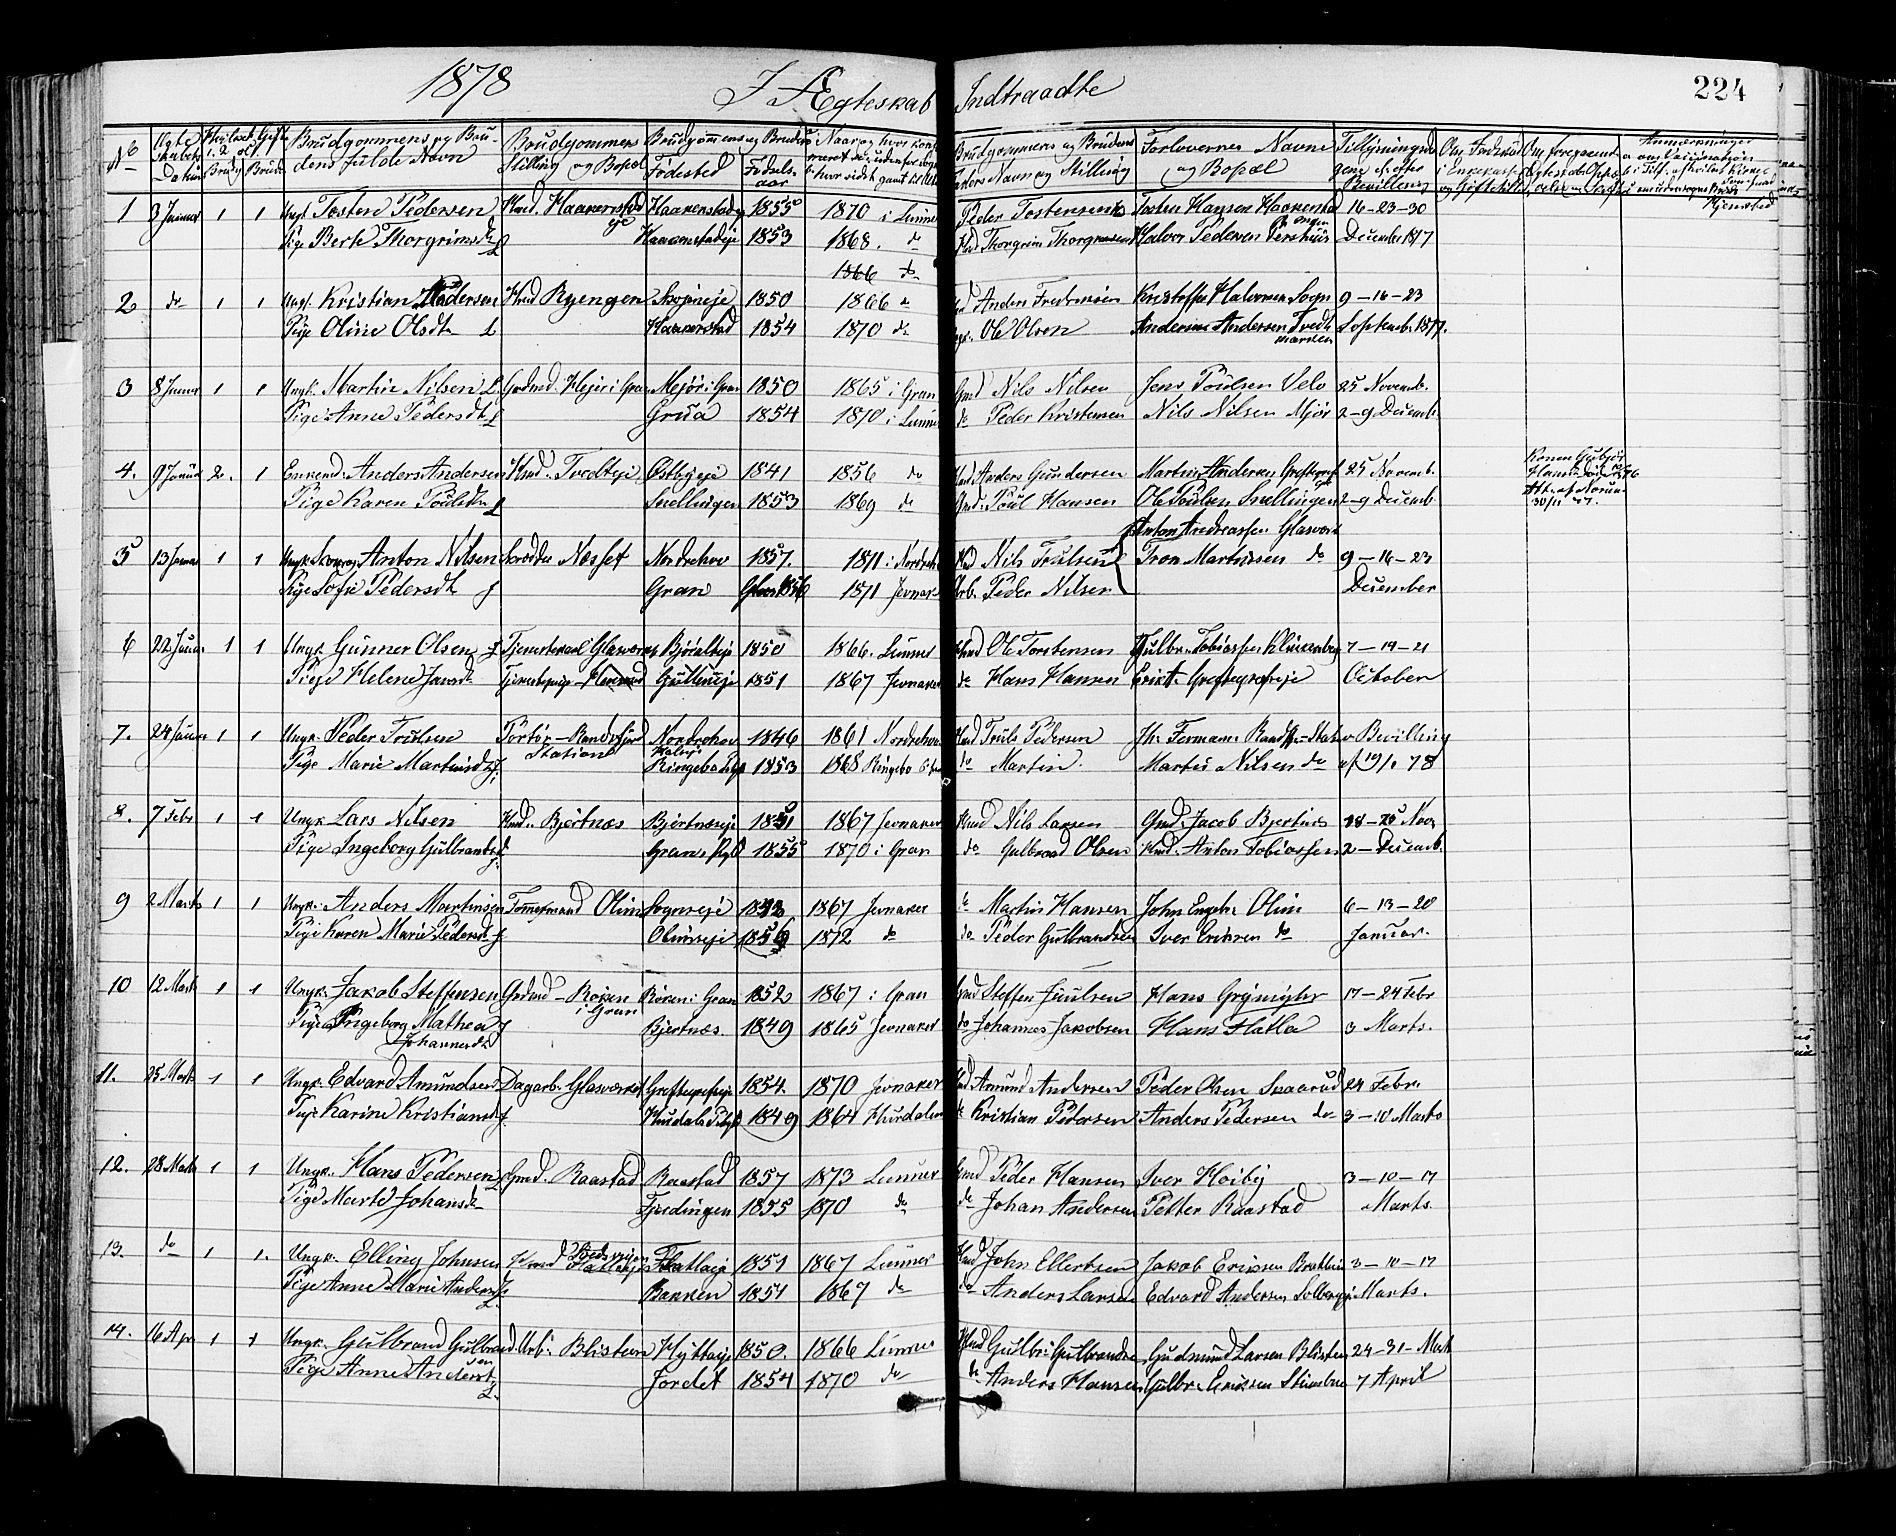 SAH, Jevnaker prestekontor, Ministerialbok nr. 8, 1877-1890, s. 224